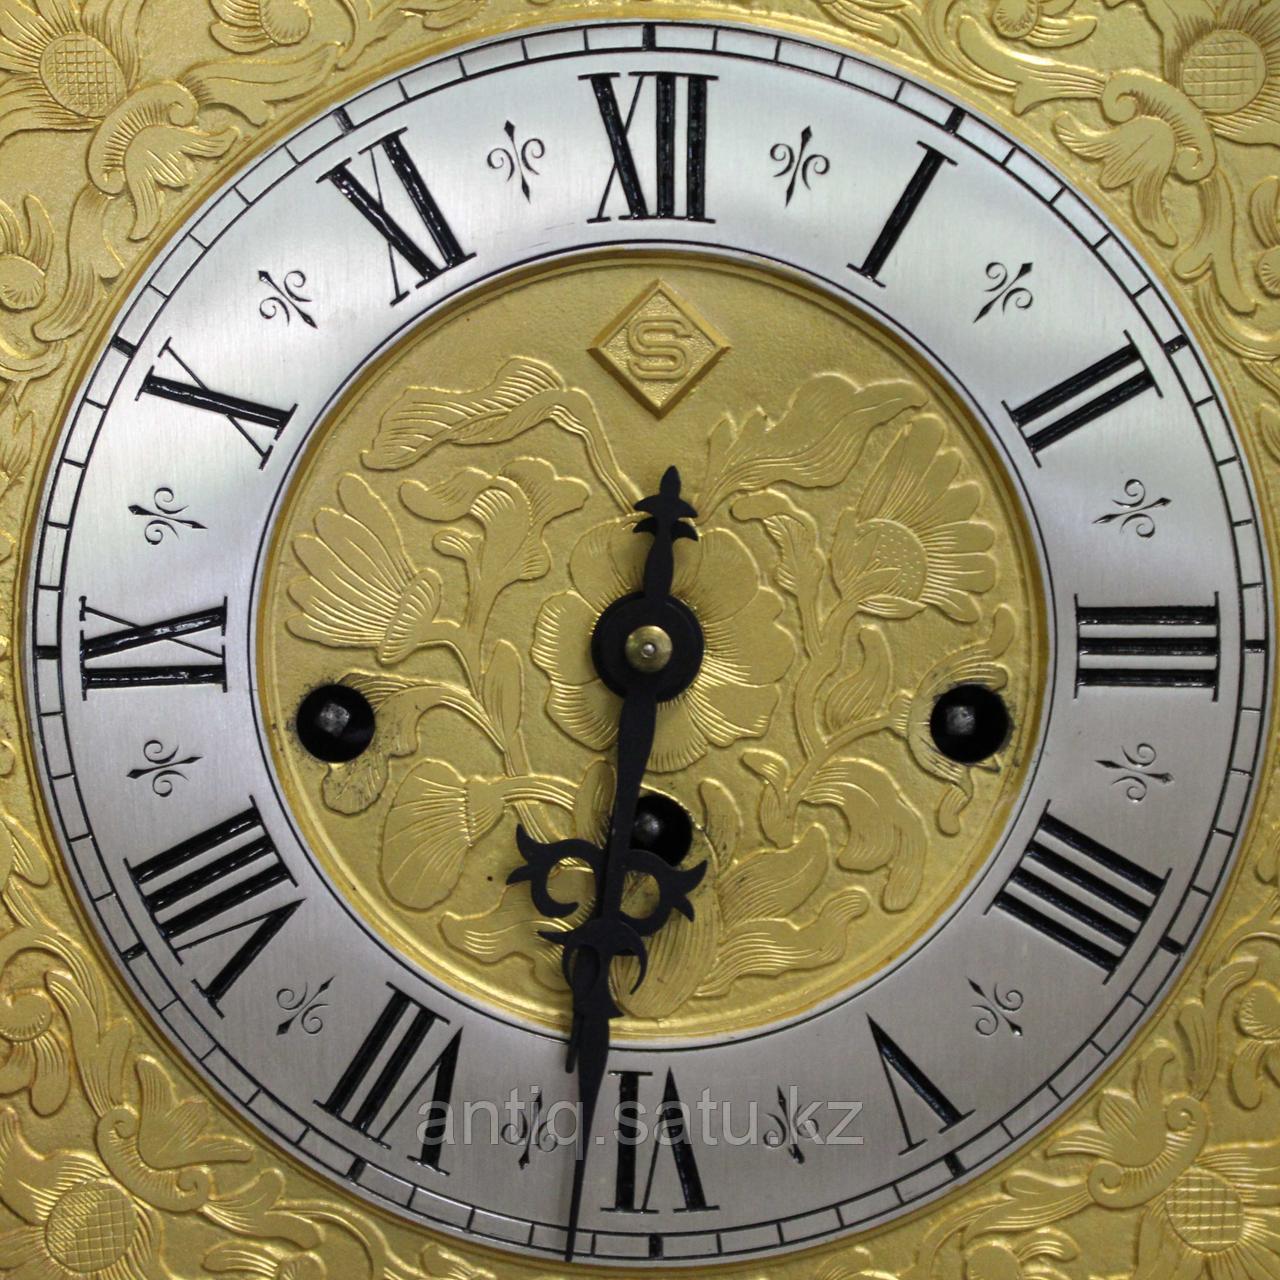 Настольные часы Часовая мастерская Emil Schmeckenbecher - фото 5